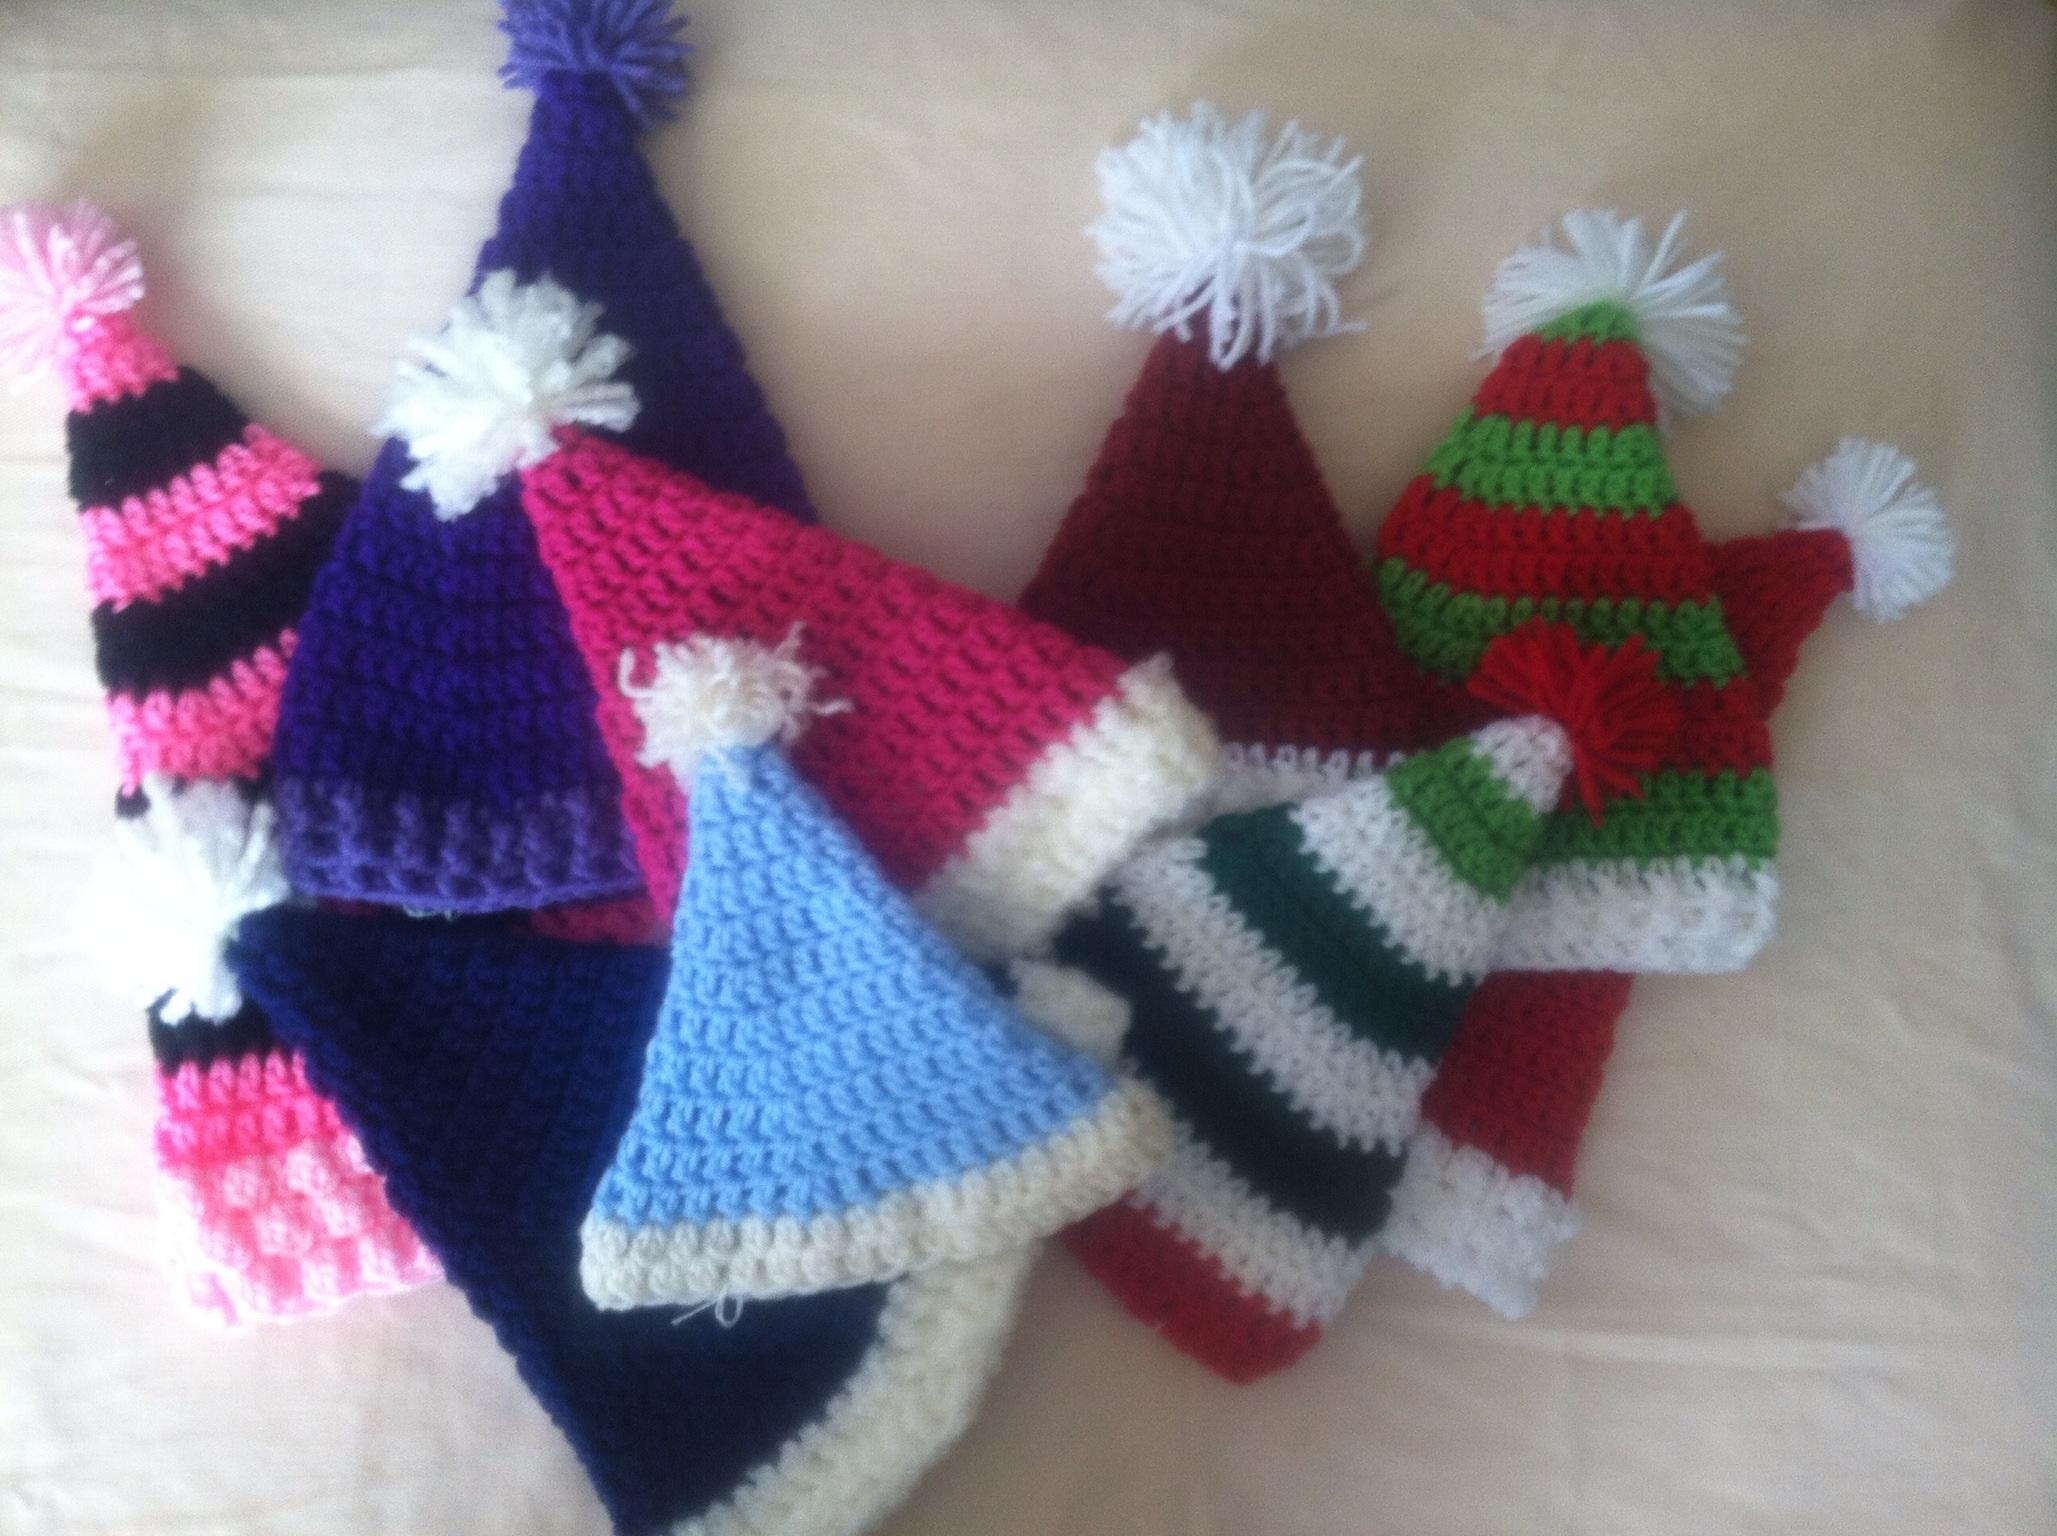 Free Crochet Pattern For Santa Hat : Santa hats crochet free pattern Family Bugs Blogging